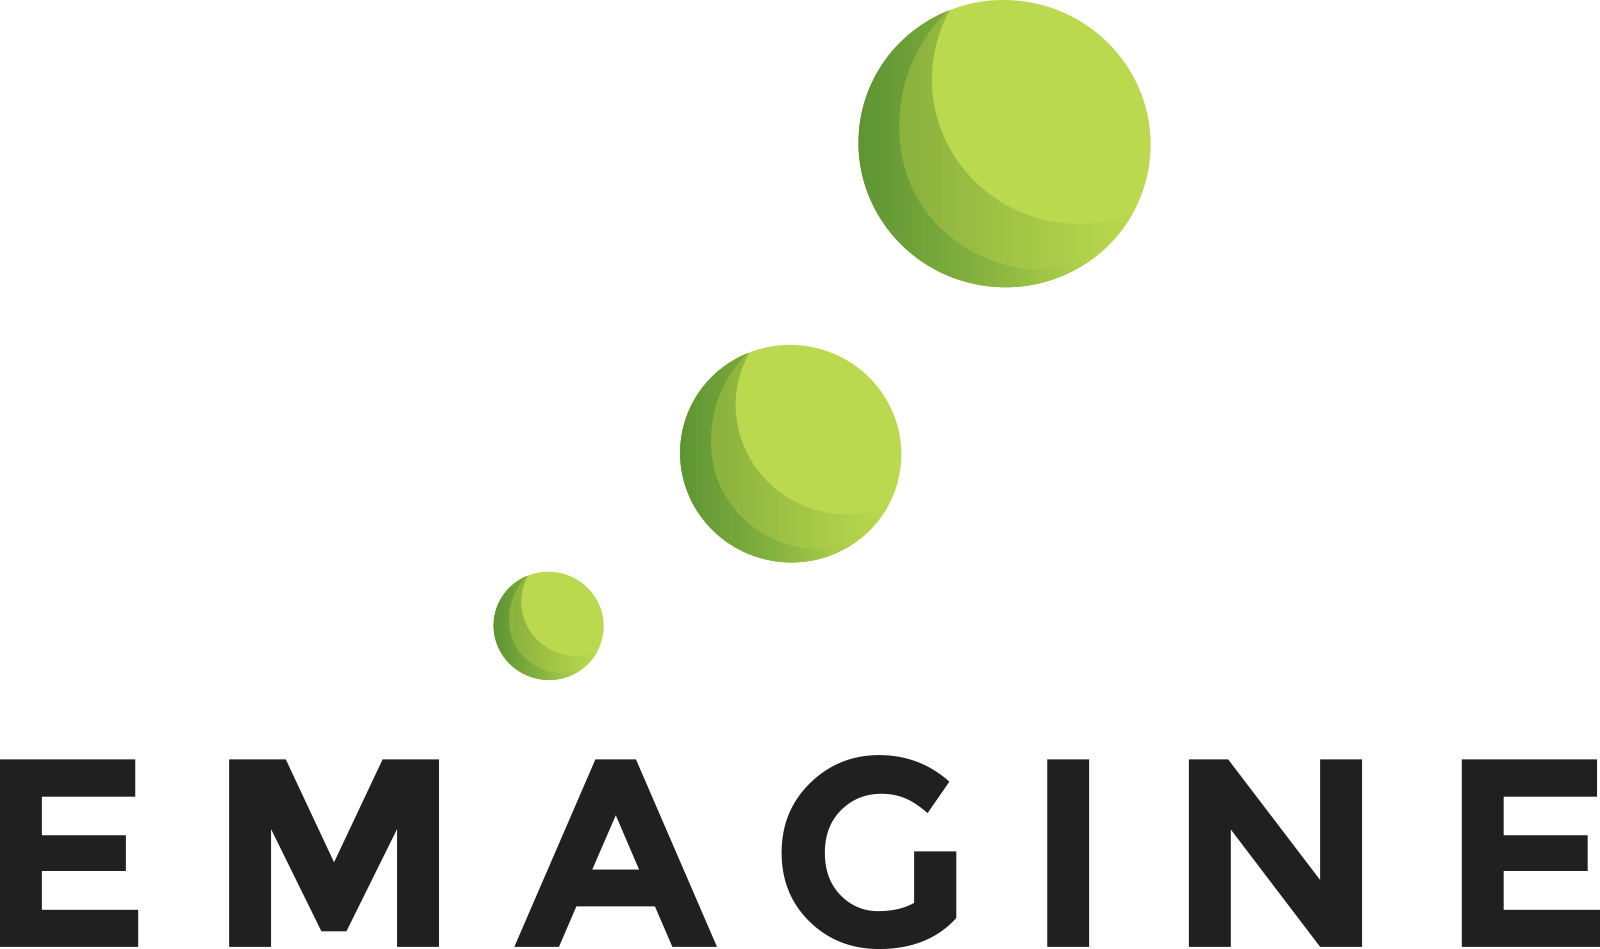 549_emagine_logo_1600x949.png